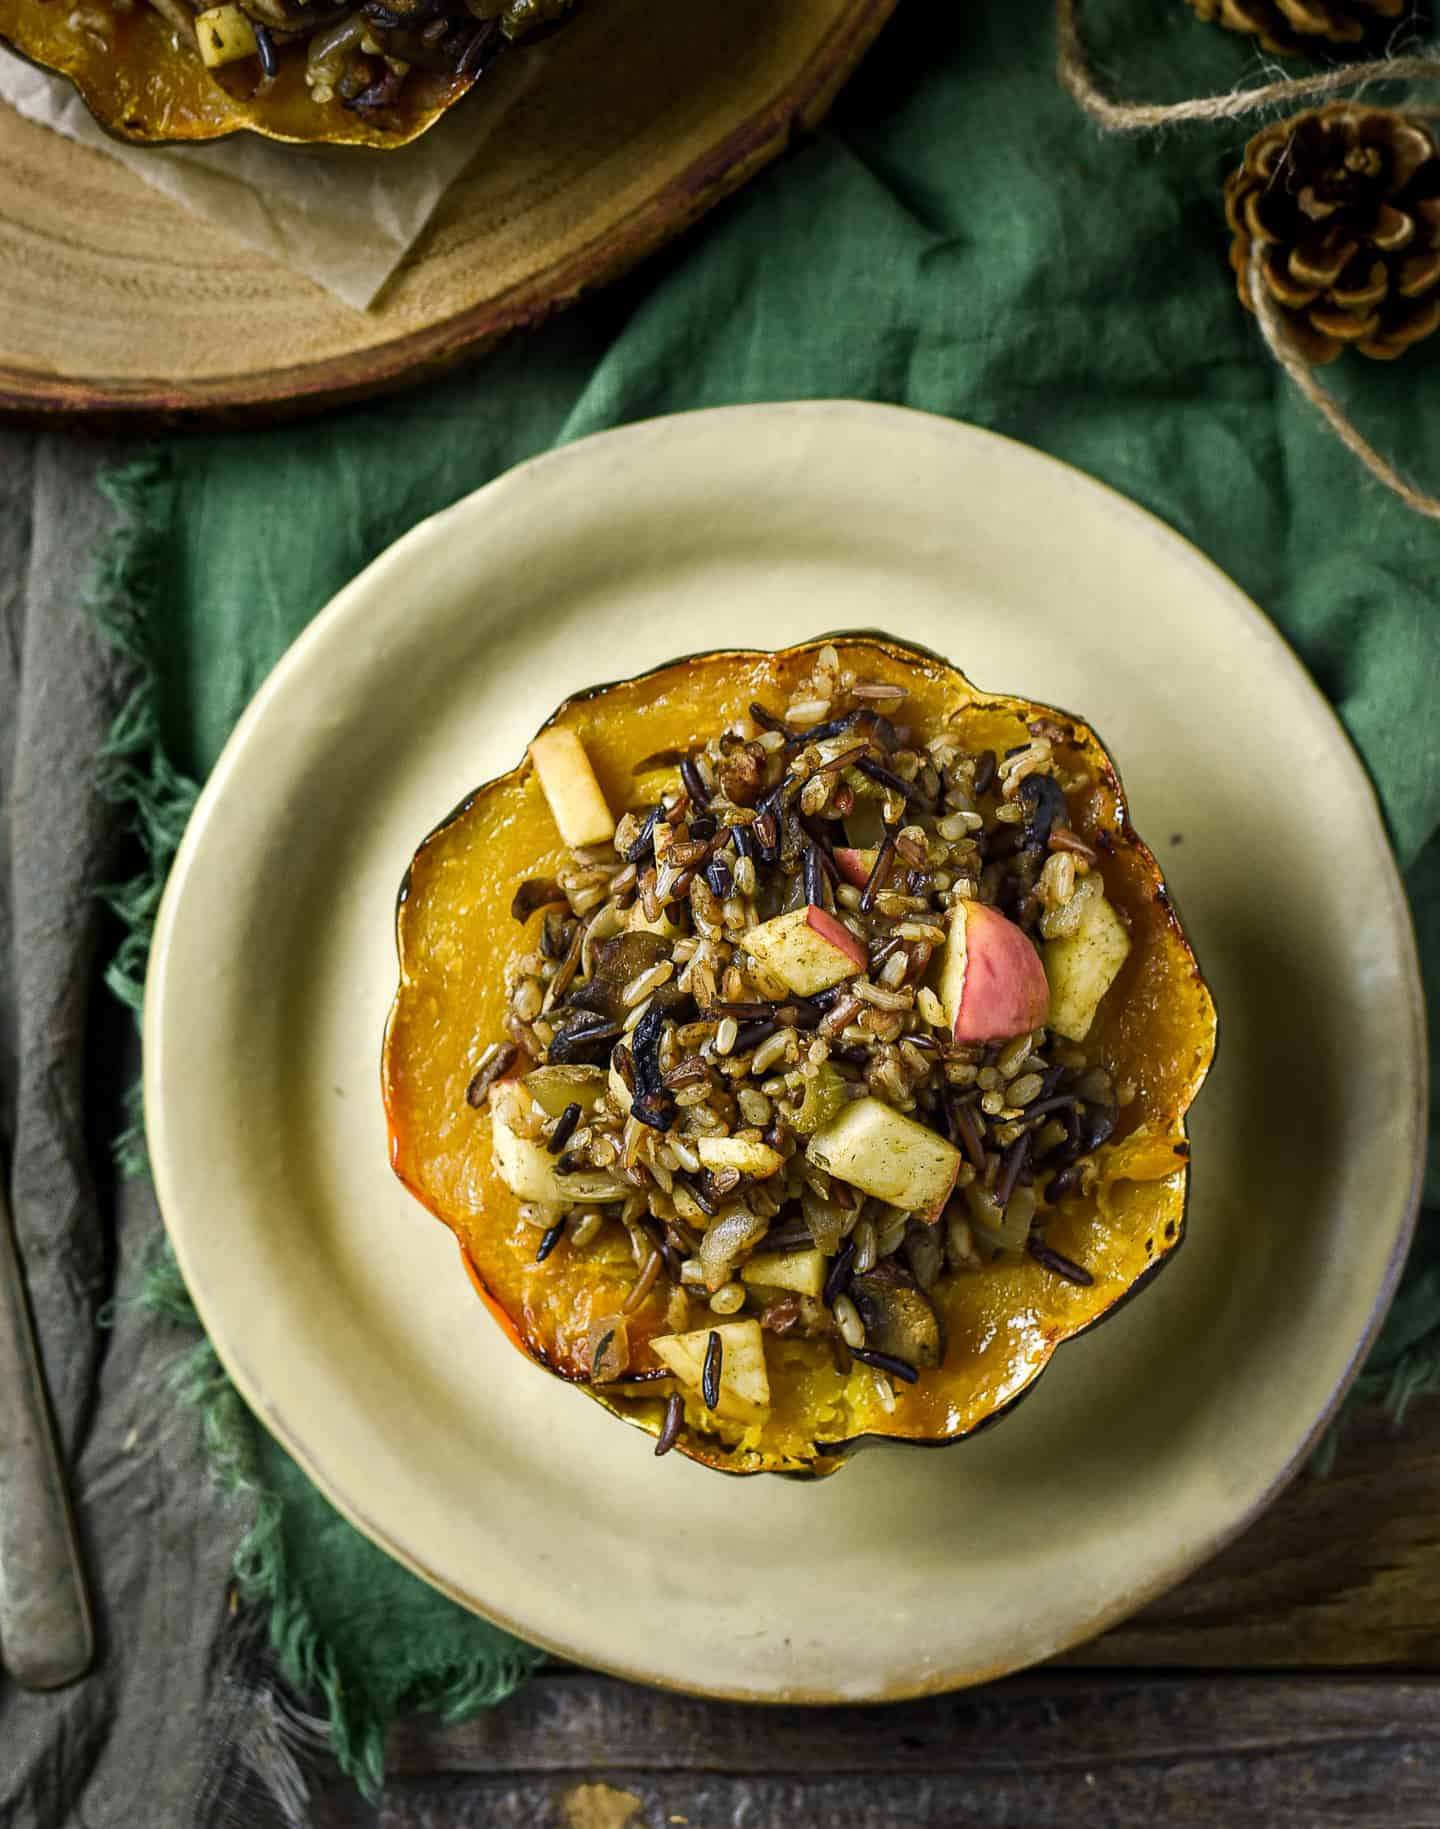 Stuffed acorn squash on plate.